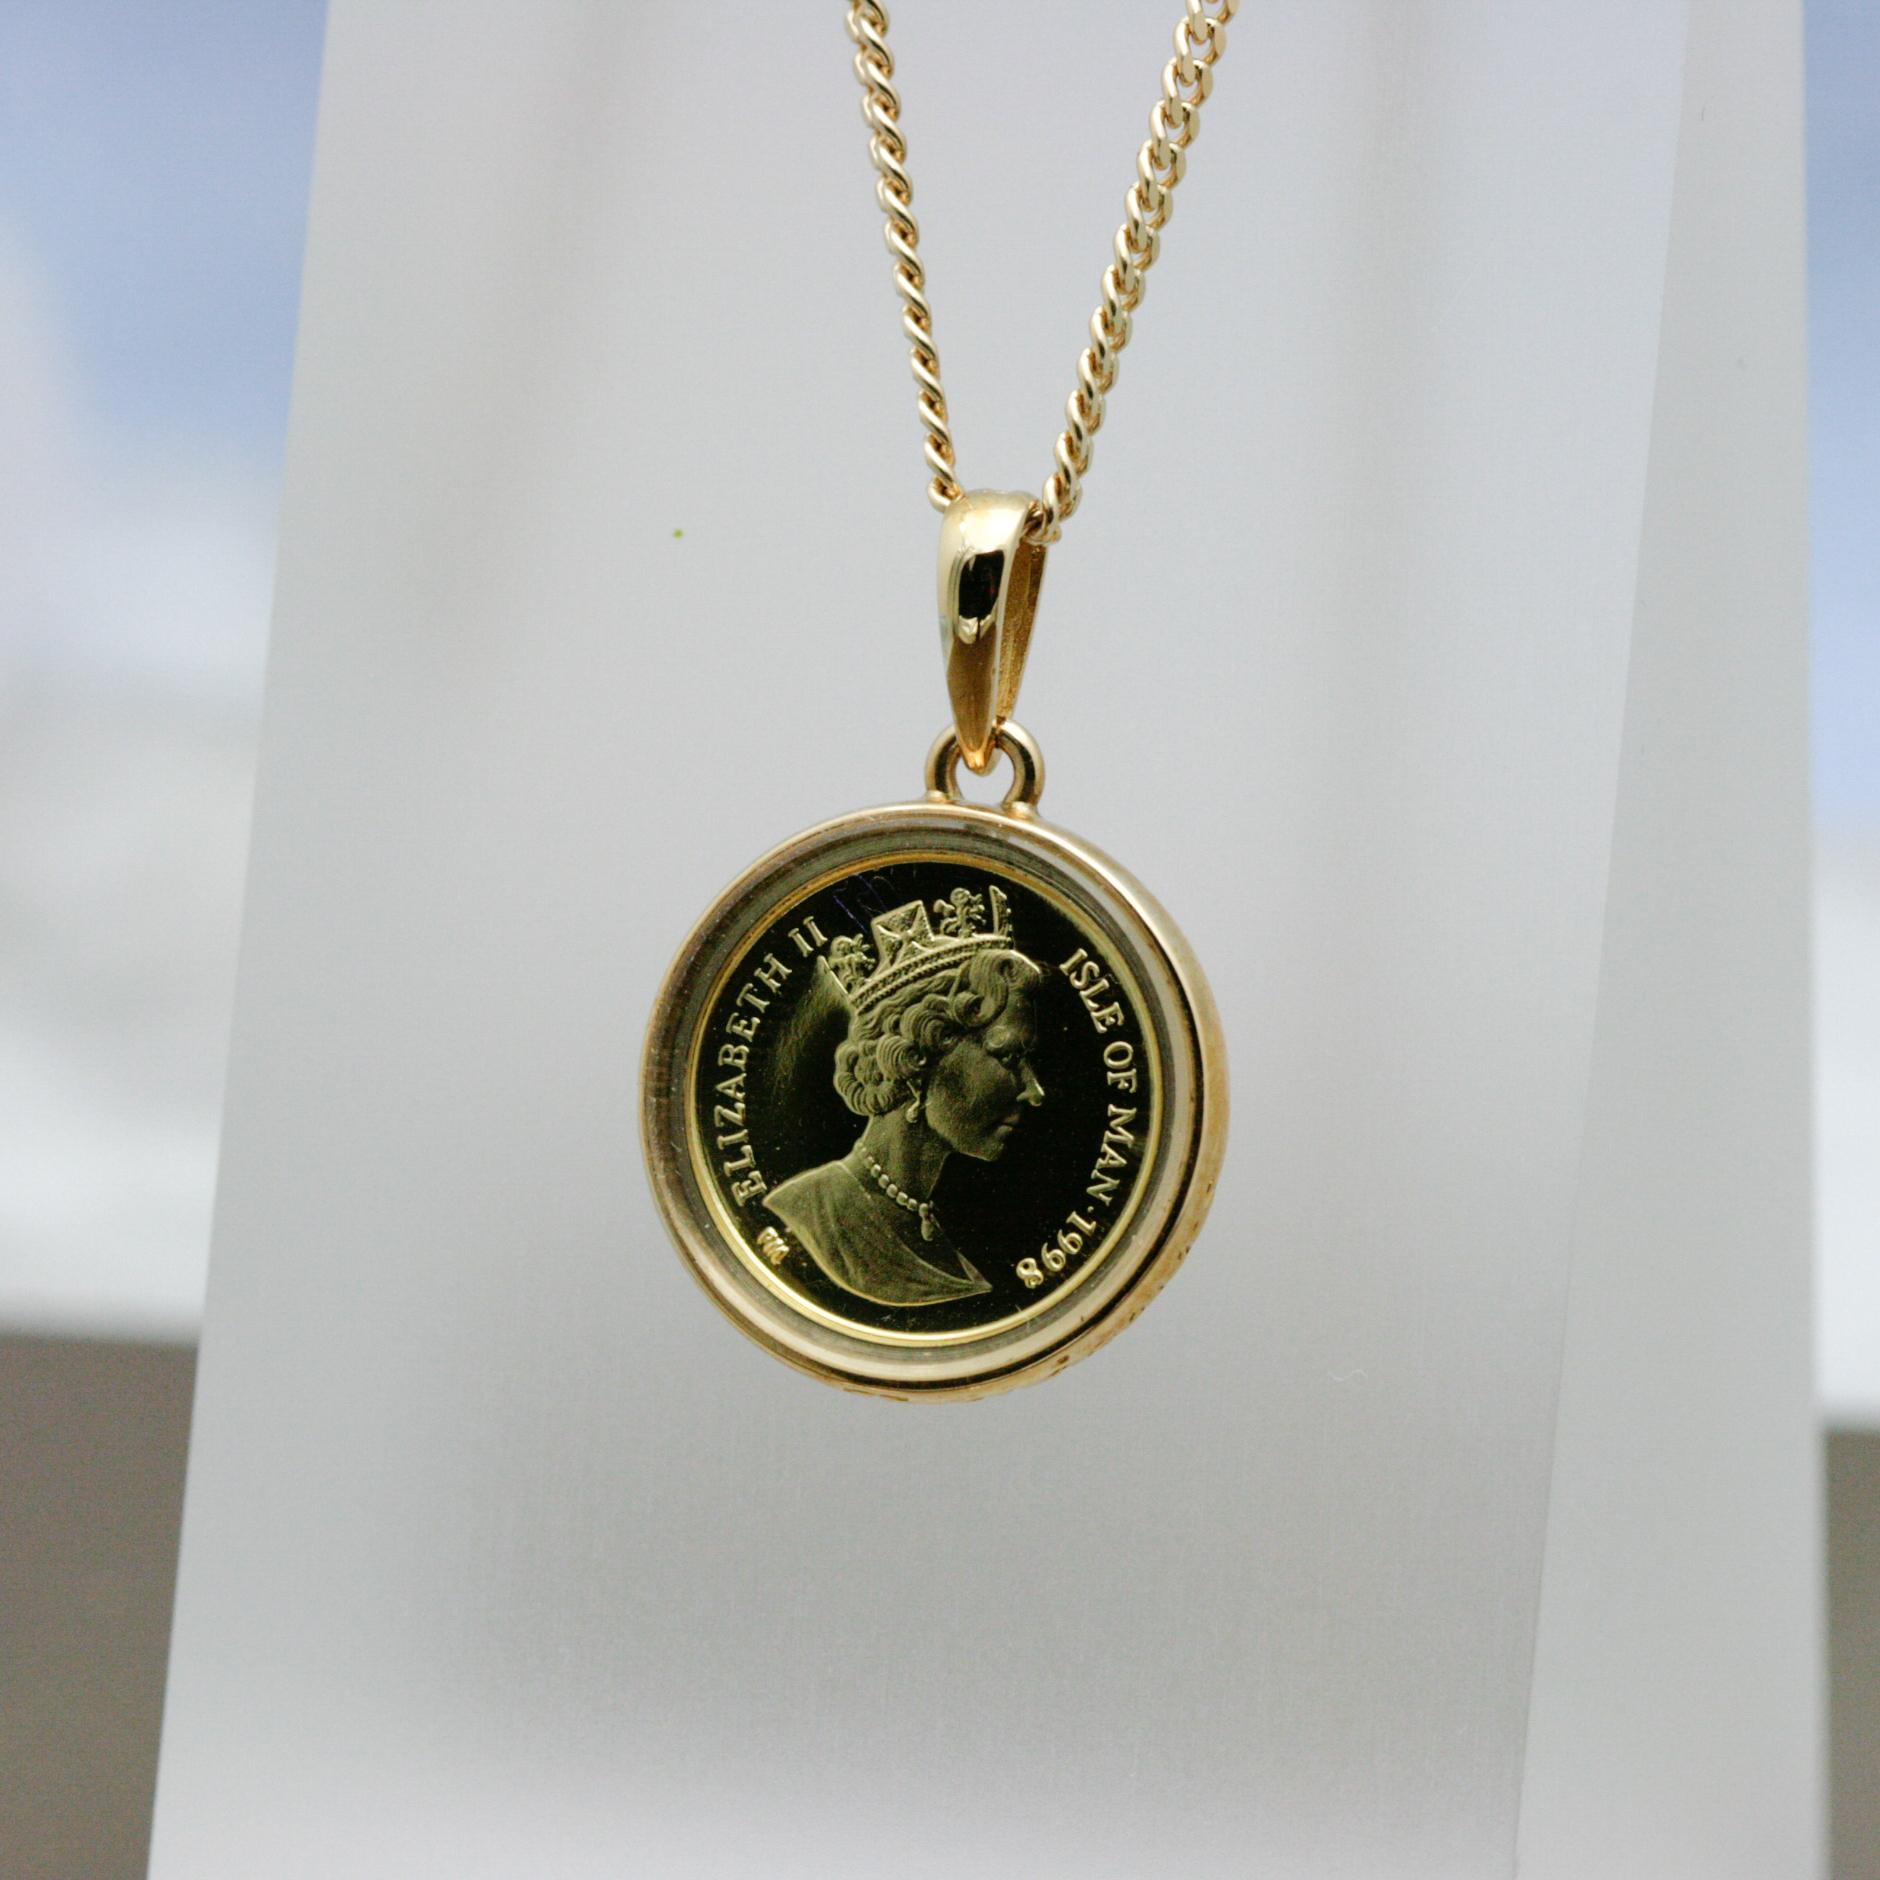 K18コイン(コインはk24)ペンダントネックレス付き